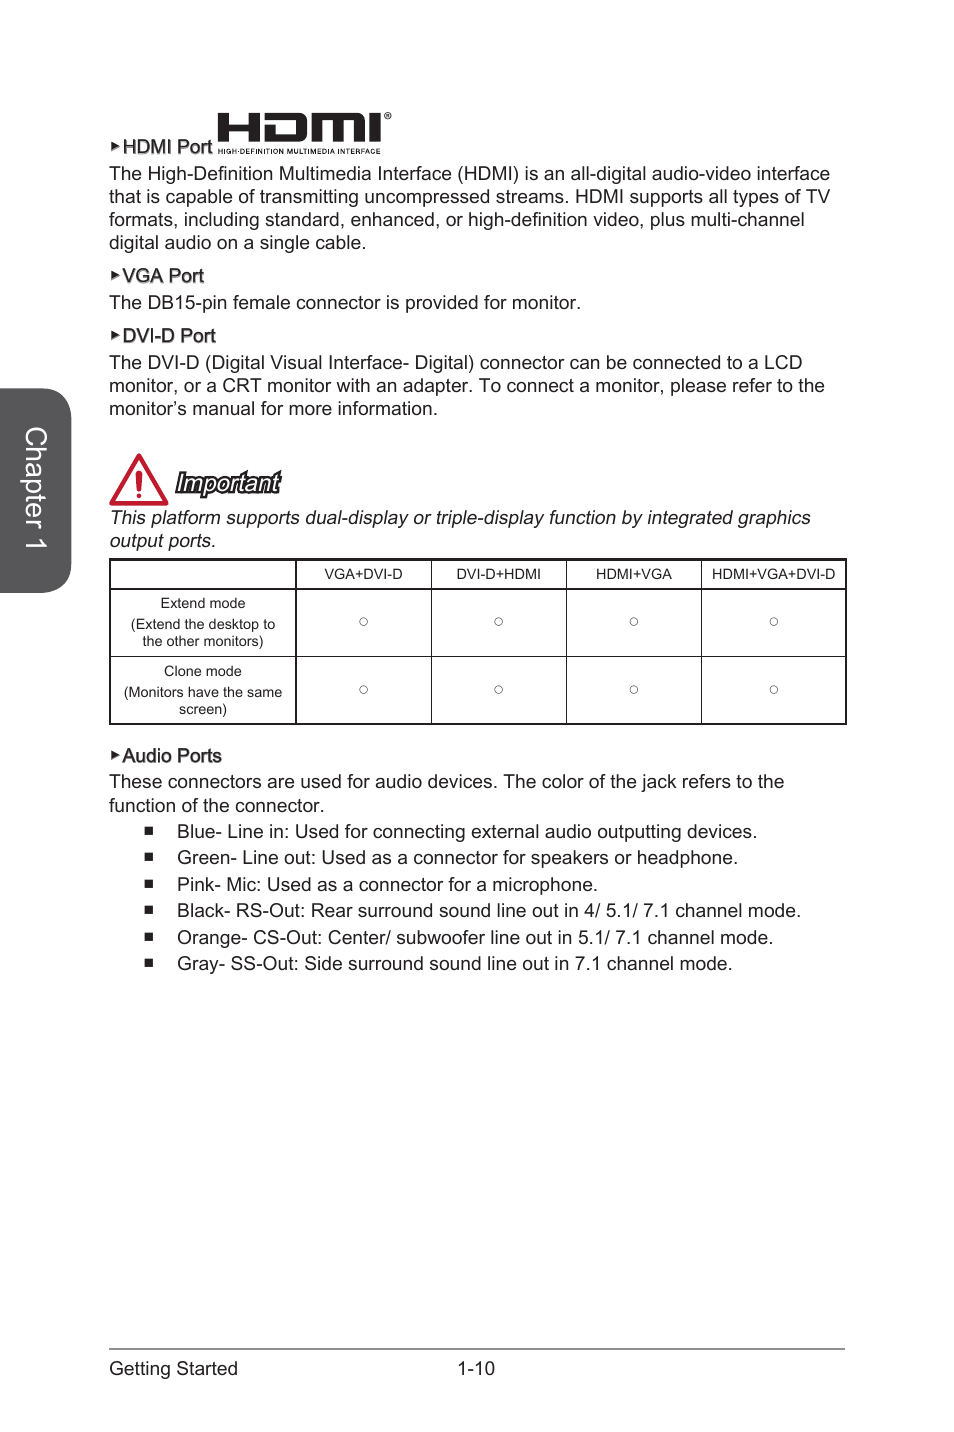 Chapter 1, Important | MSI Z97S SLI KRAIT EDITION Manual